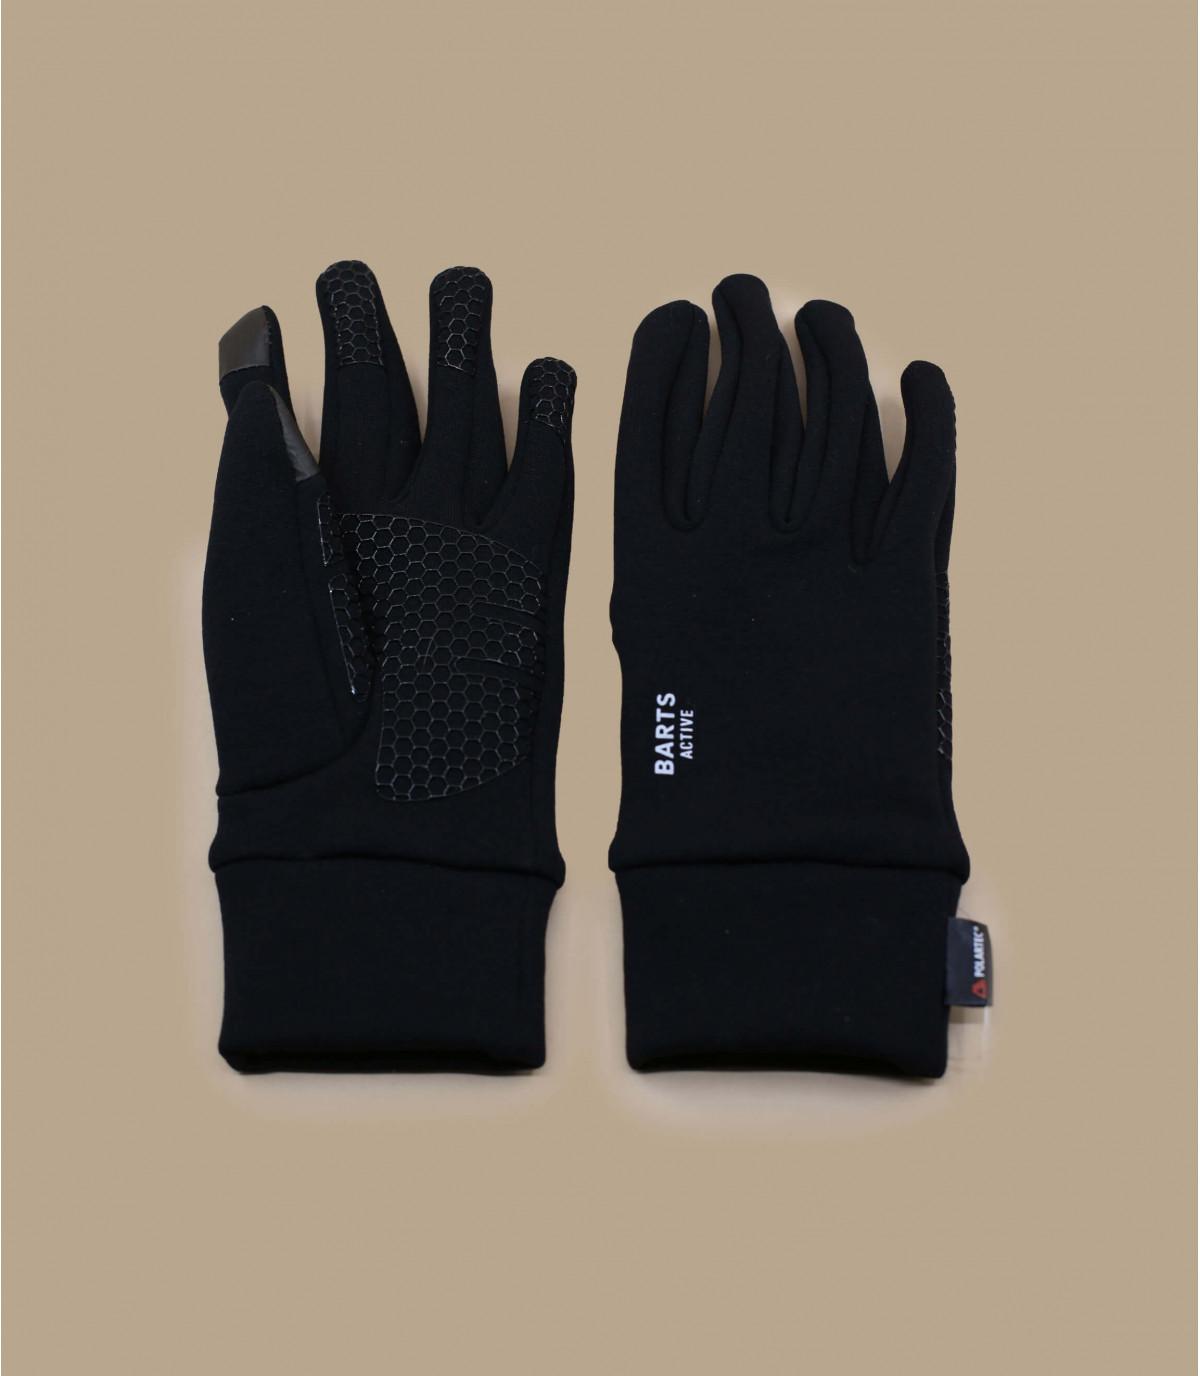 Détails Powerstretch touch gloves black - image 2